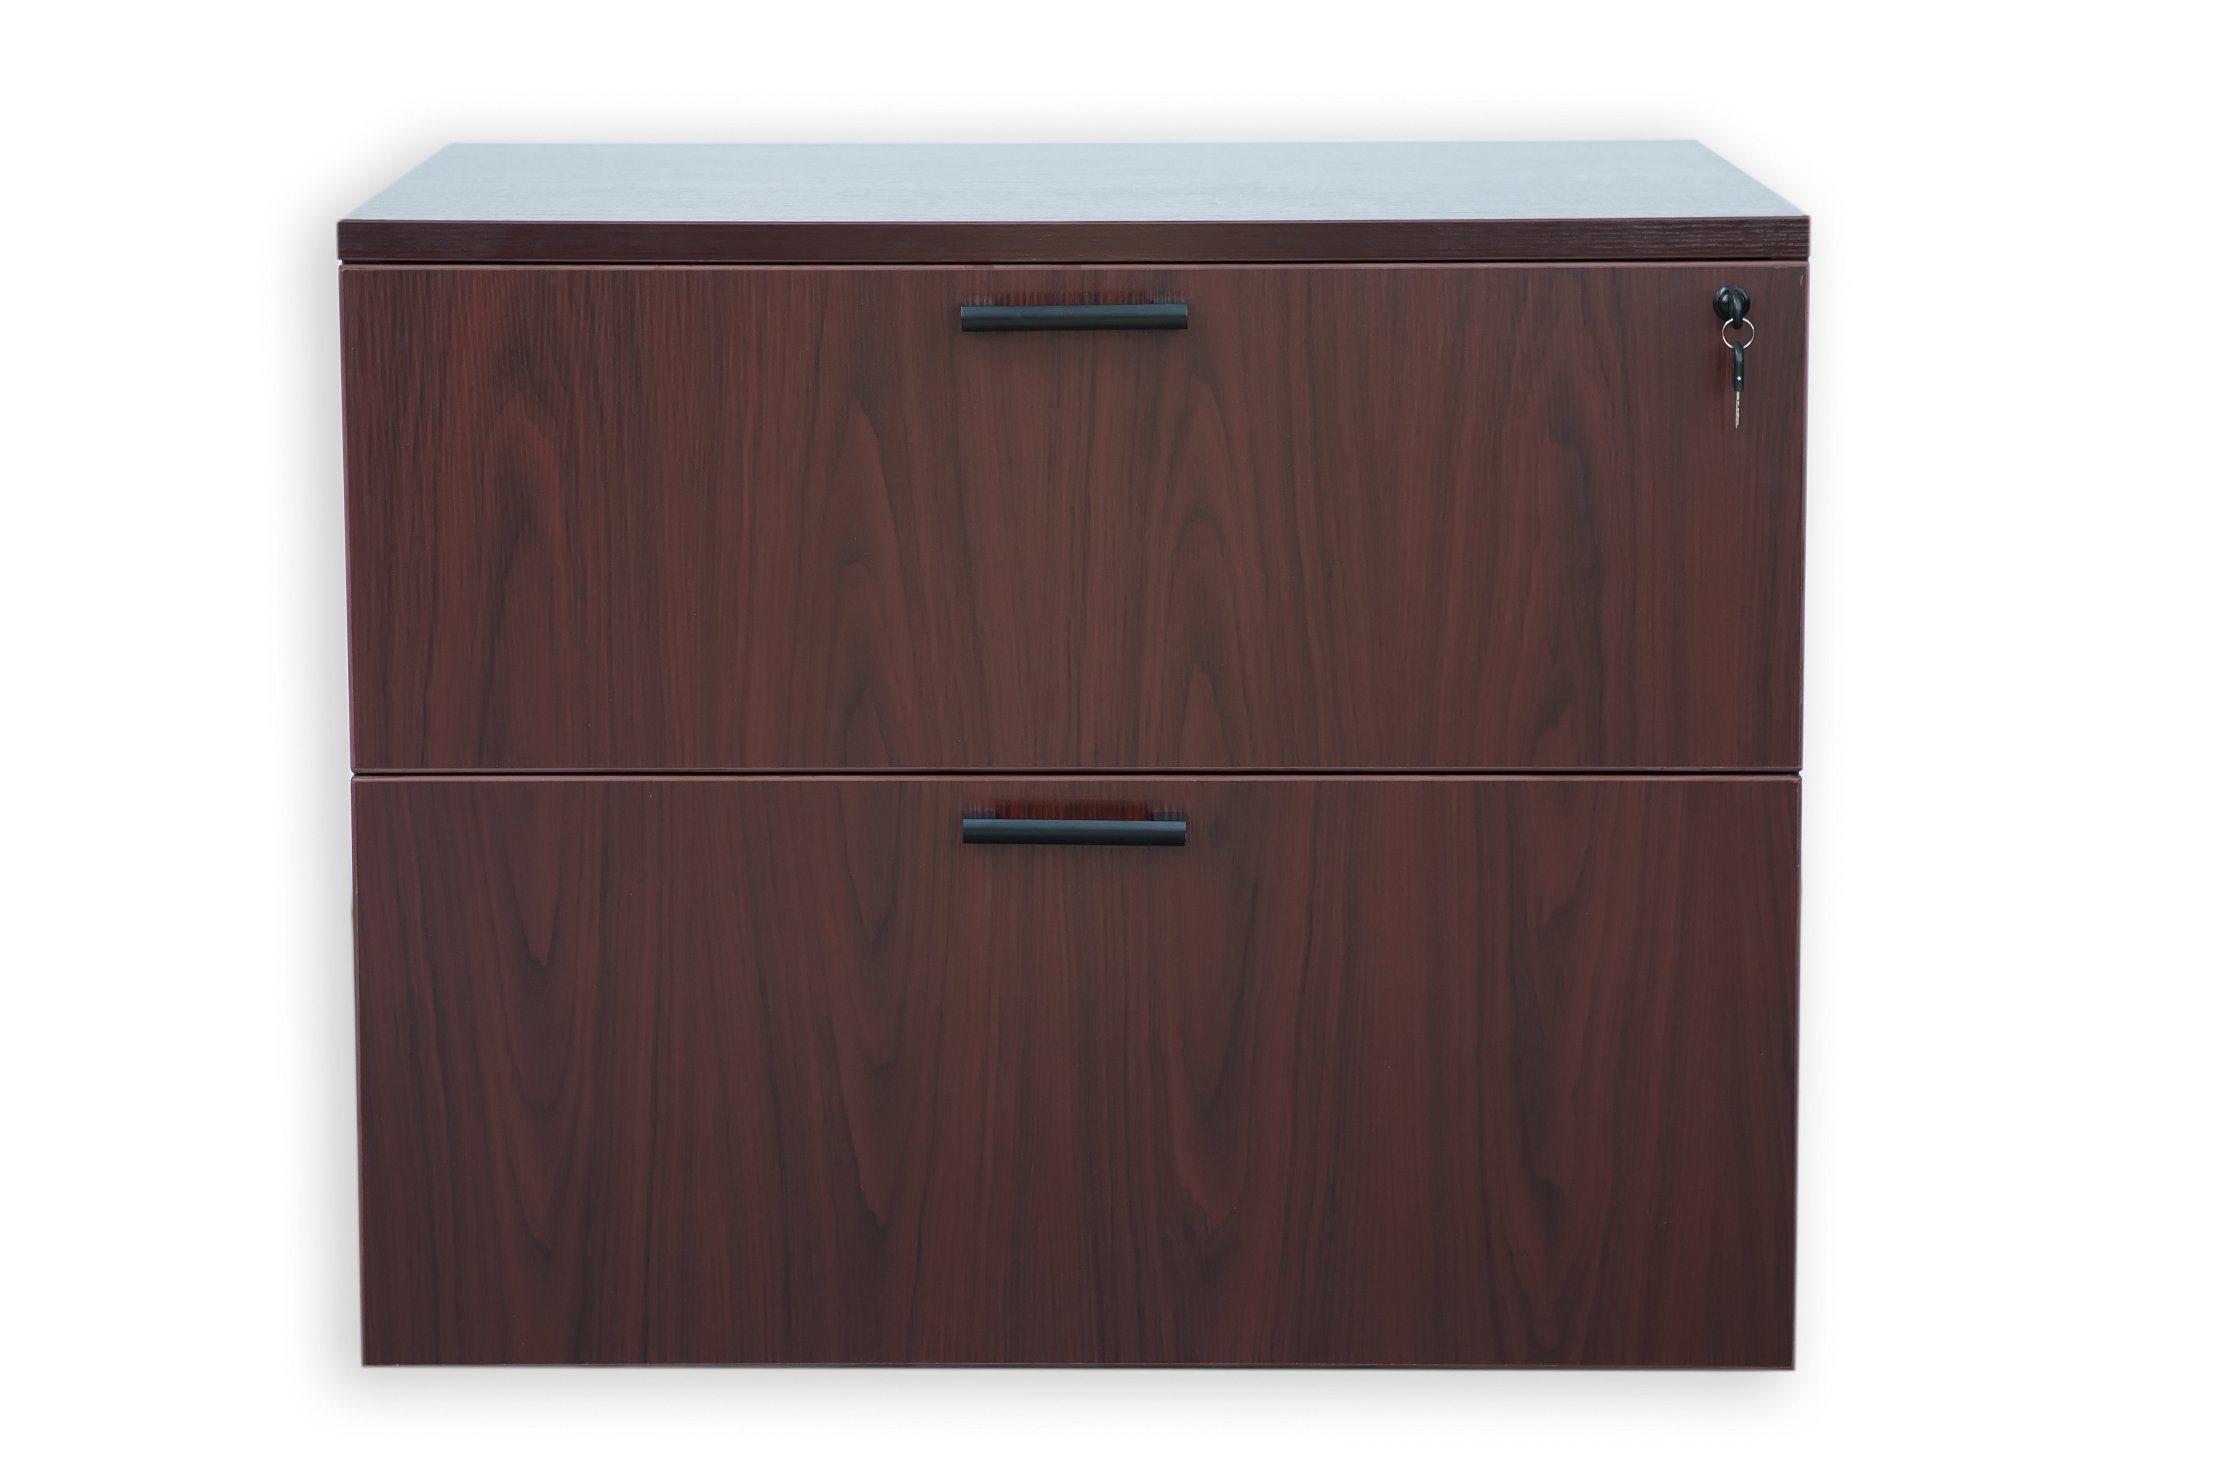 Modern Design Storage Cabinet 2-Drawer Lateral File